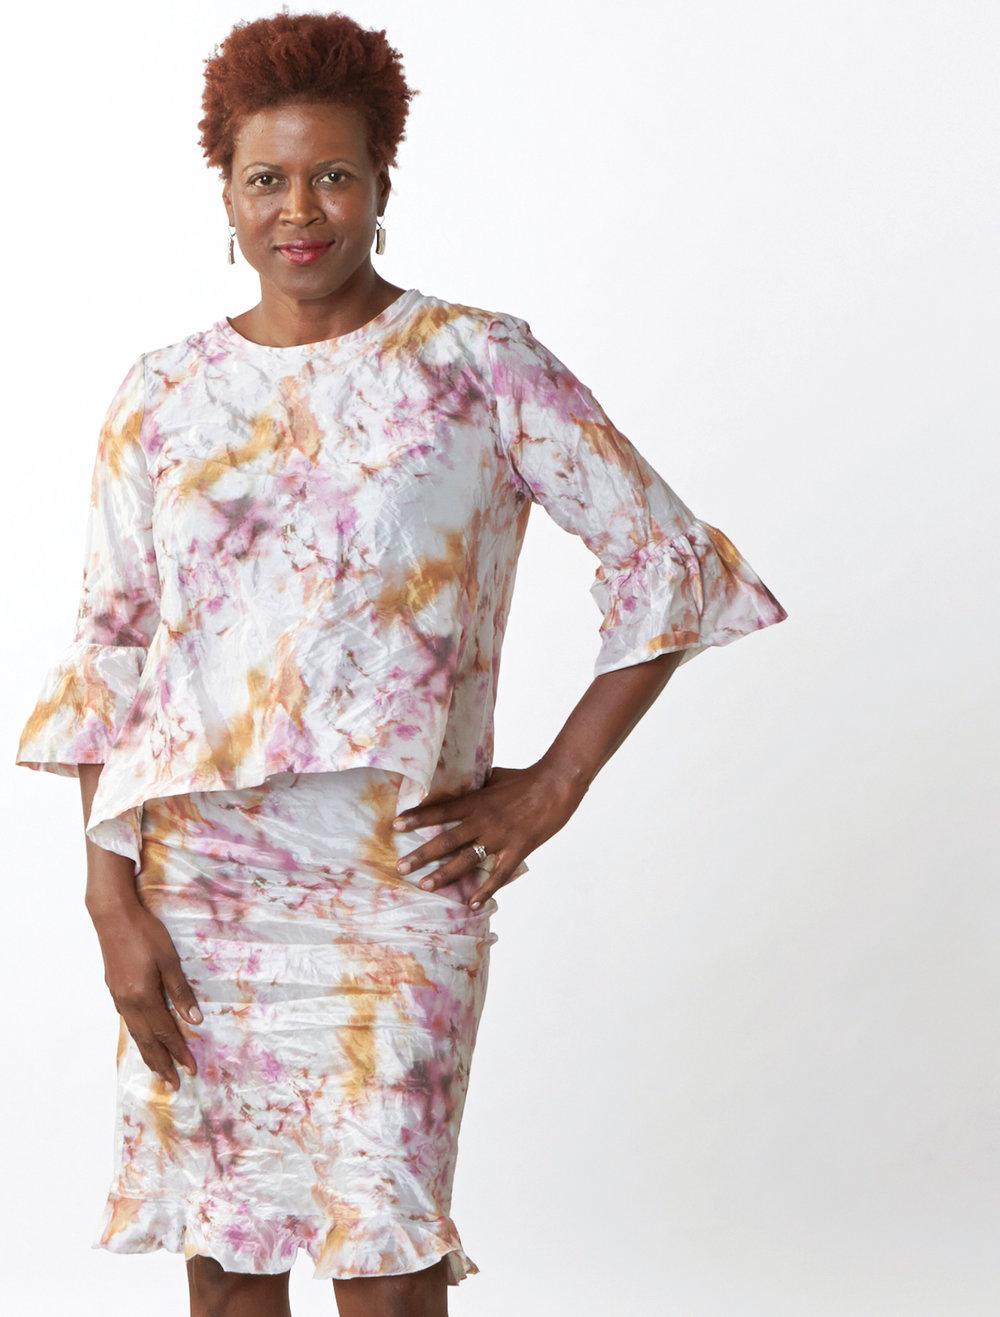 Fran Shirt, Short Skirt in Versailles Italian Memory Crunch Taffeta